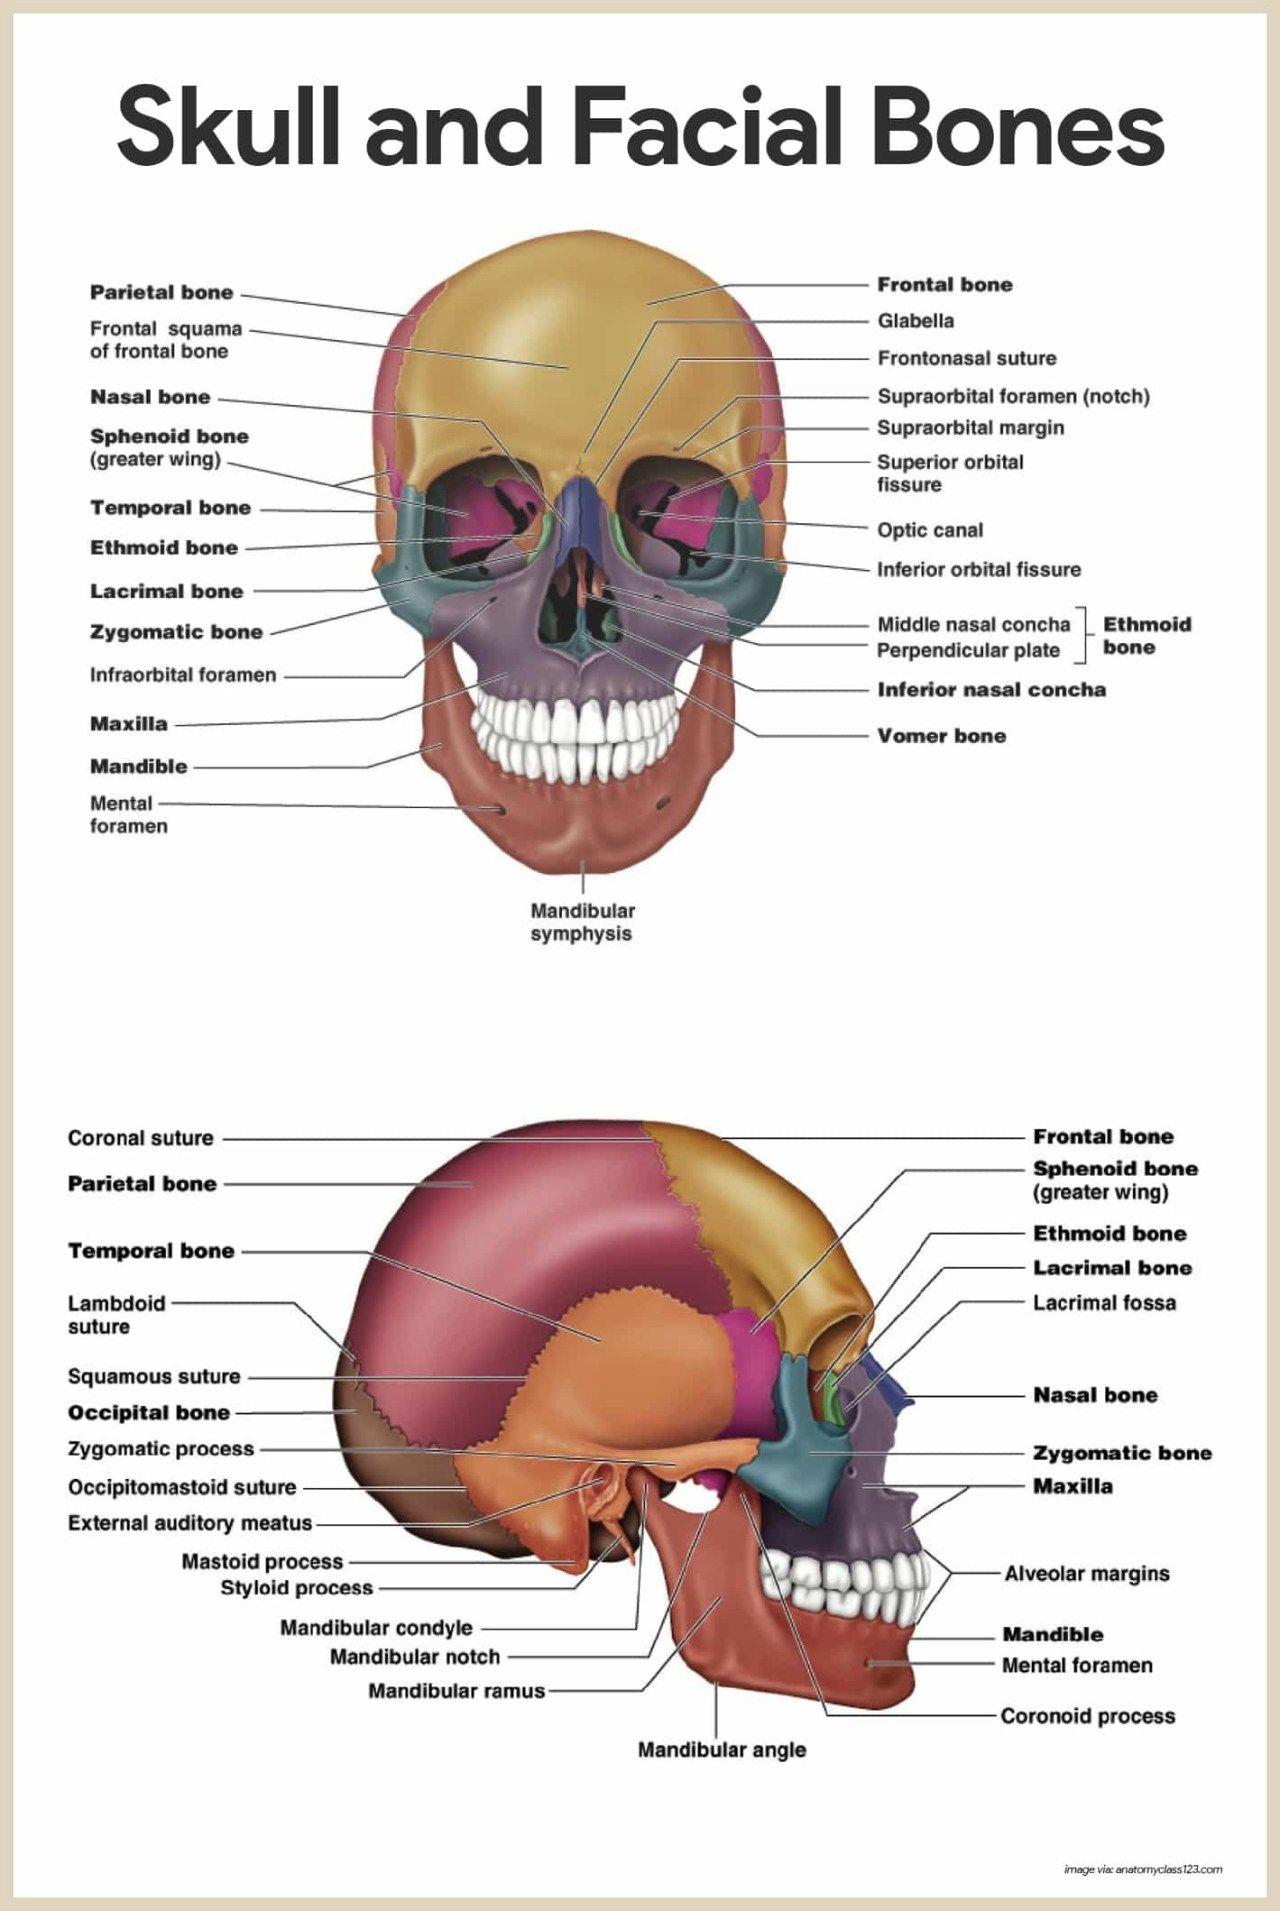 anatomy bones learning skeletal system anatomy and physiology nurseslabs [ 1280 x 1911 Pixel ]